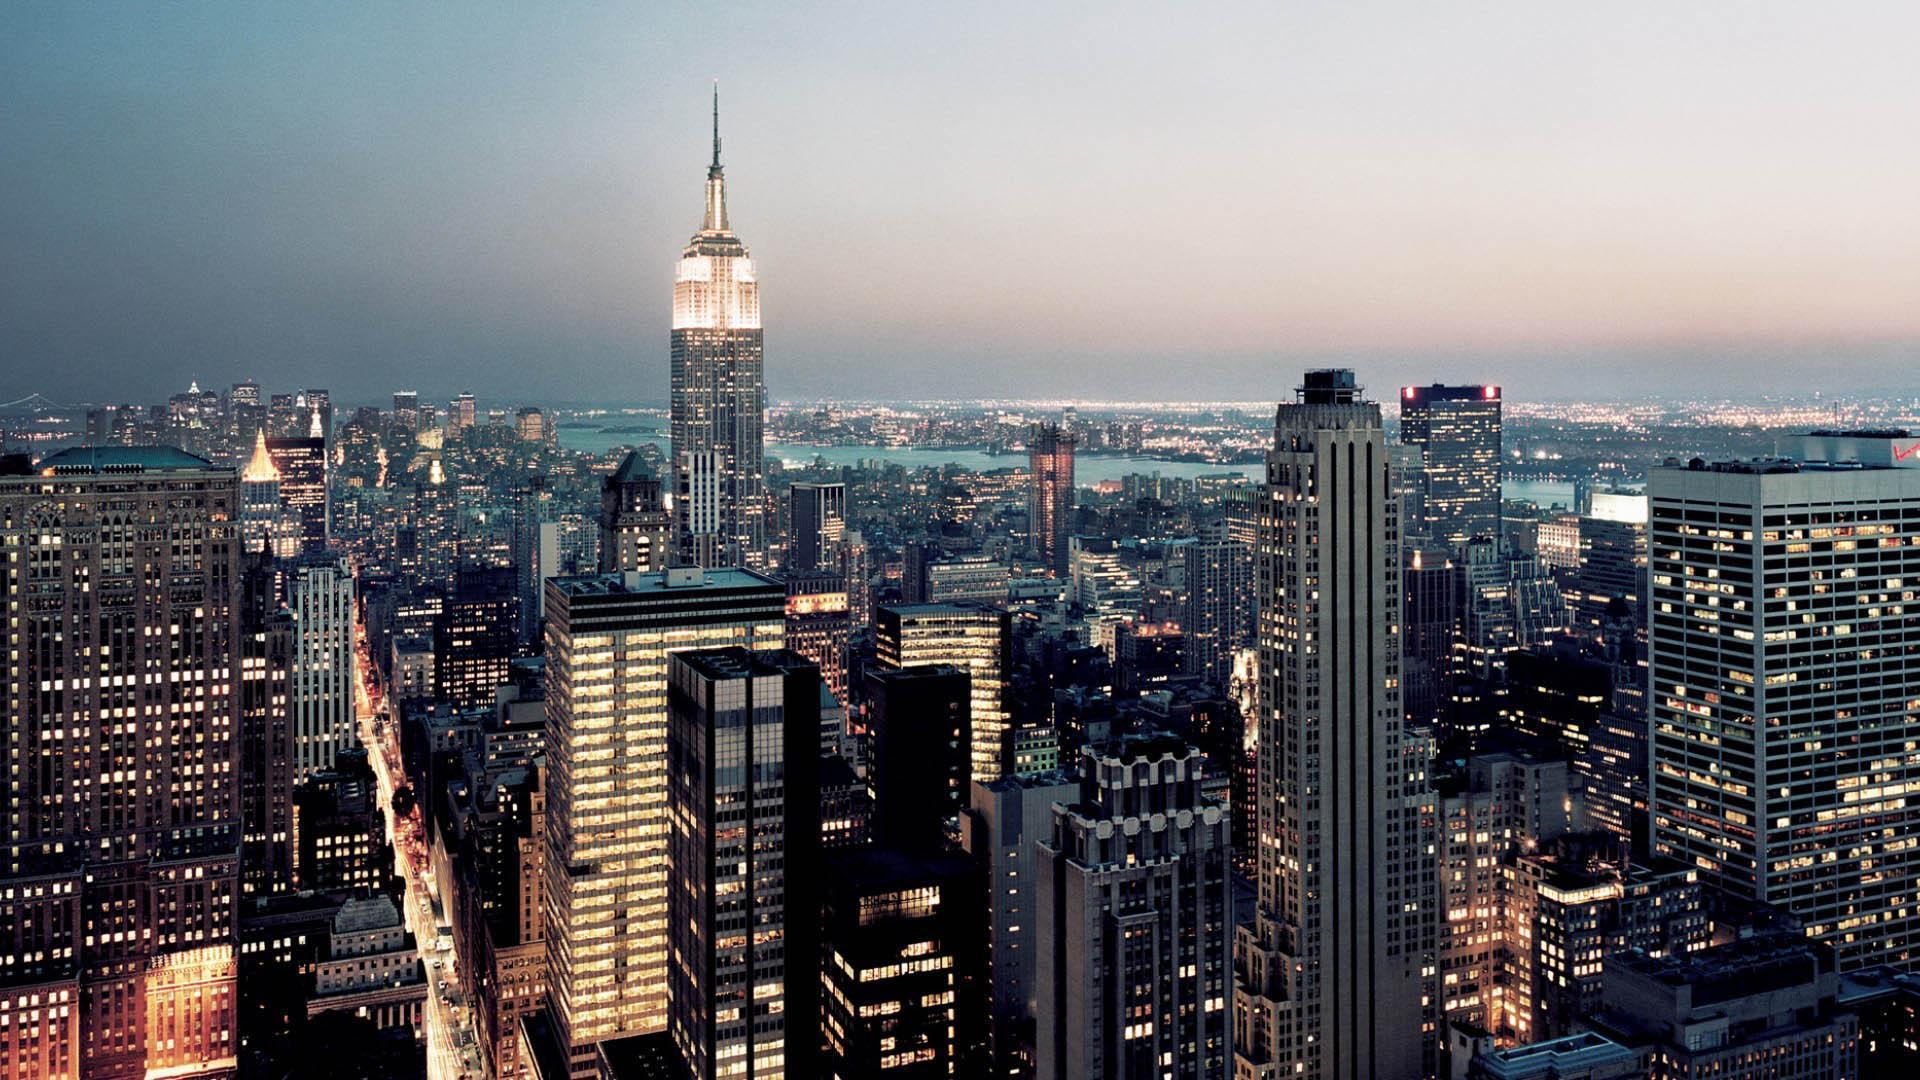 New York City Wallpapers Widescreen 1920x1080